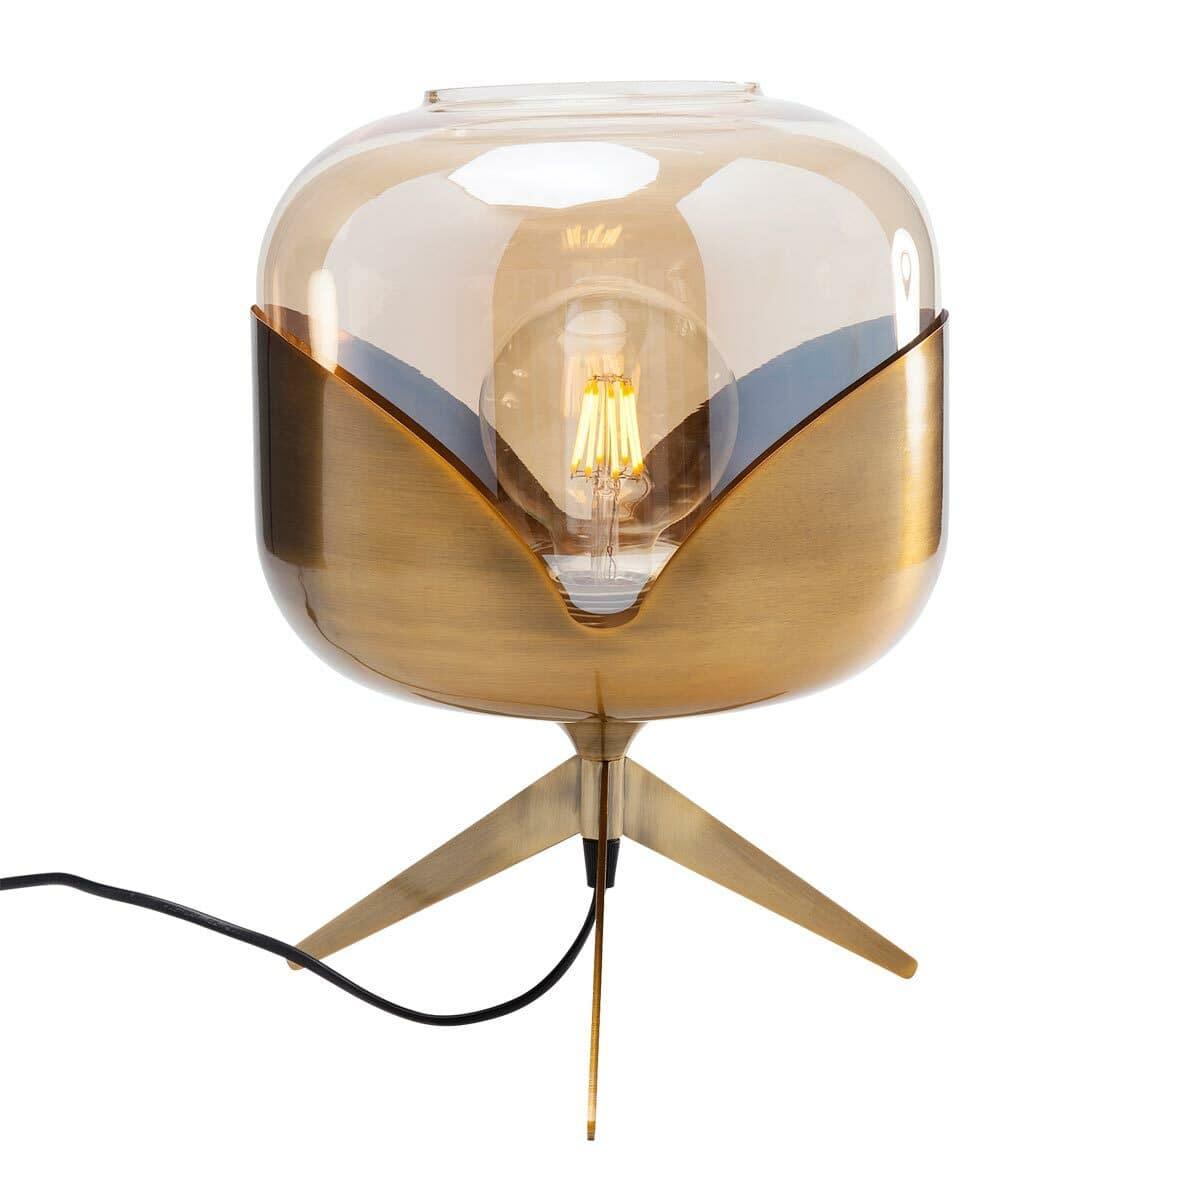 Kare Tischleuchte Golden Goblet Ball